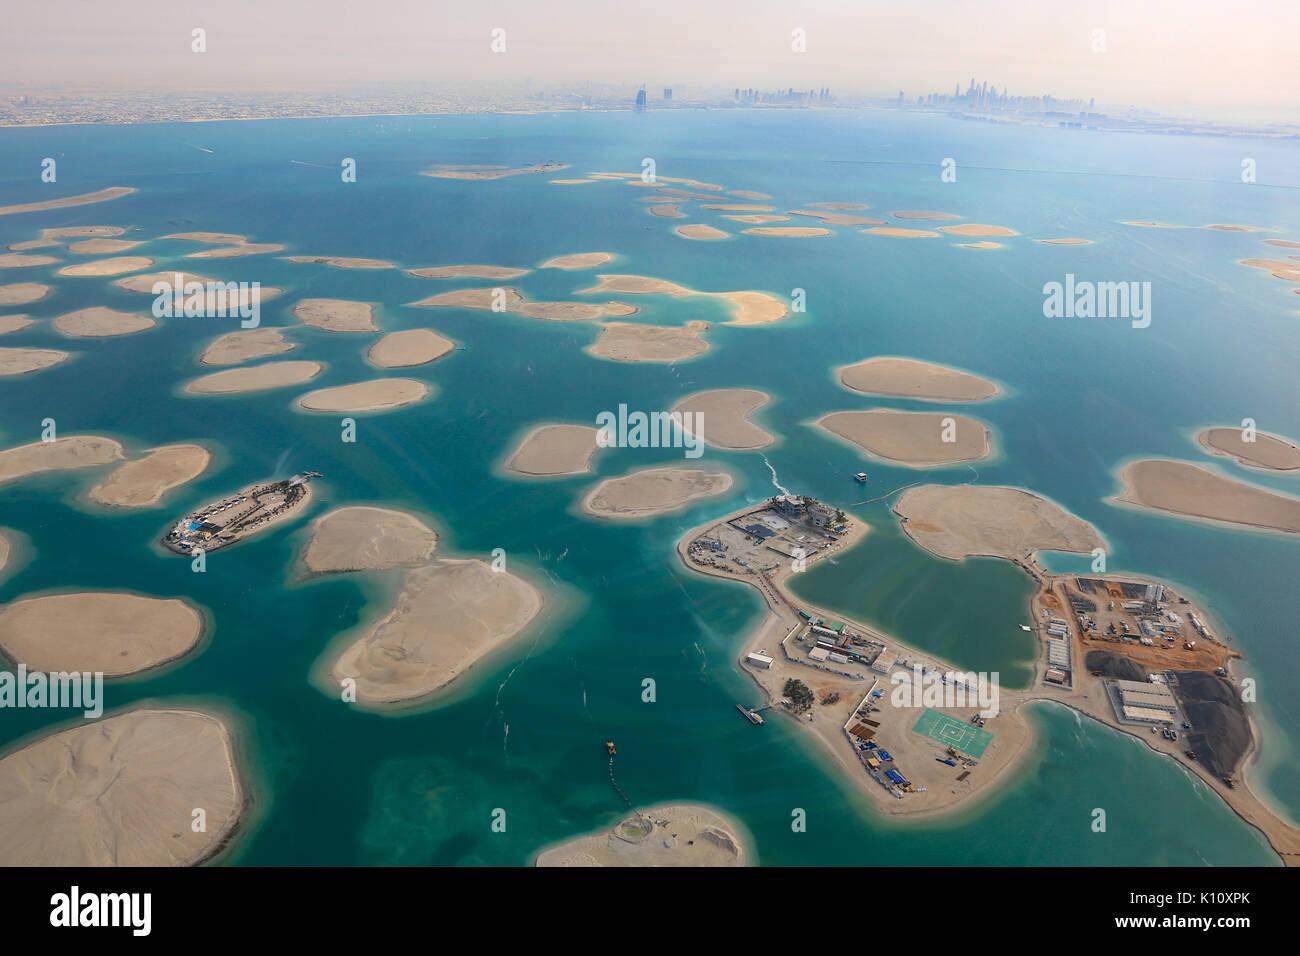 Dubai The World Islands Germany Austria Switzerland Lebanon panorama Island aerial view photography UAE - Stock Image